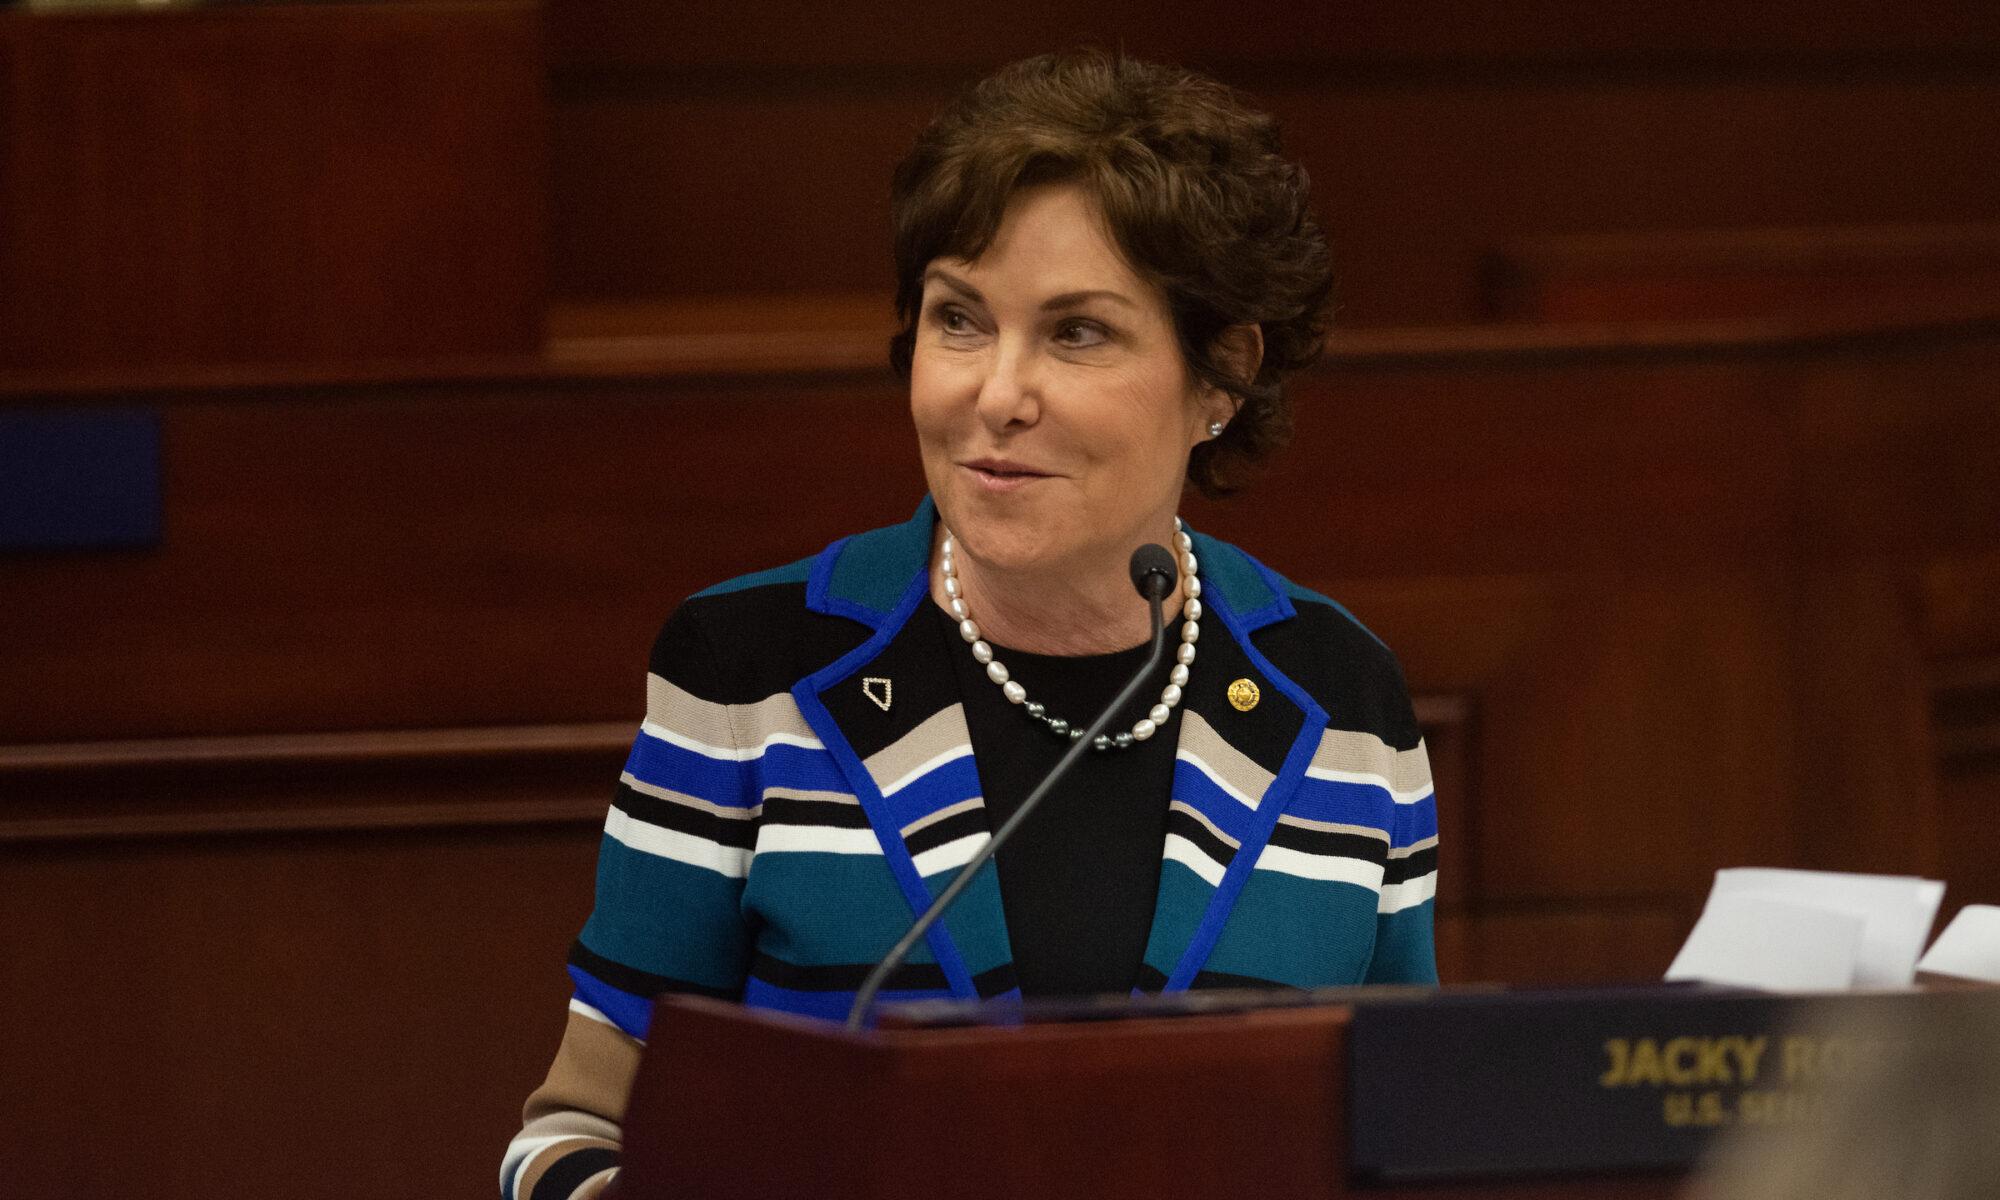 Senator Jacky Rosen in a striped sweater speaking to the Nevada Legislature